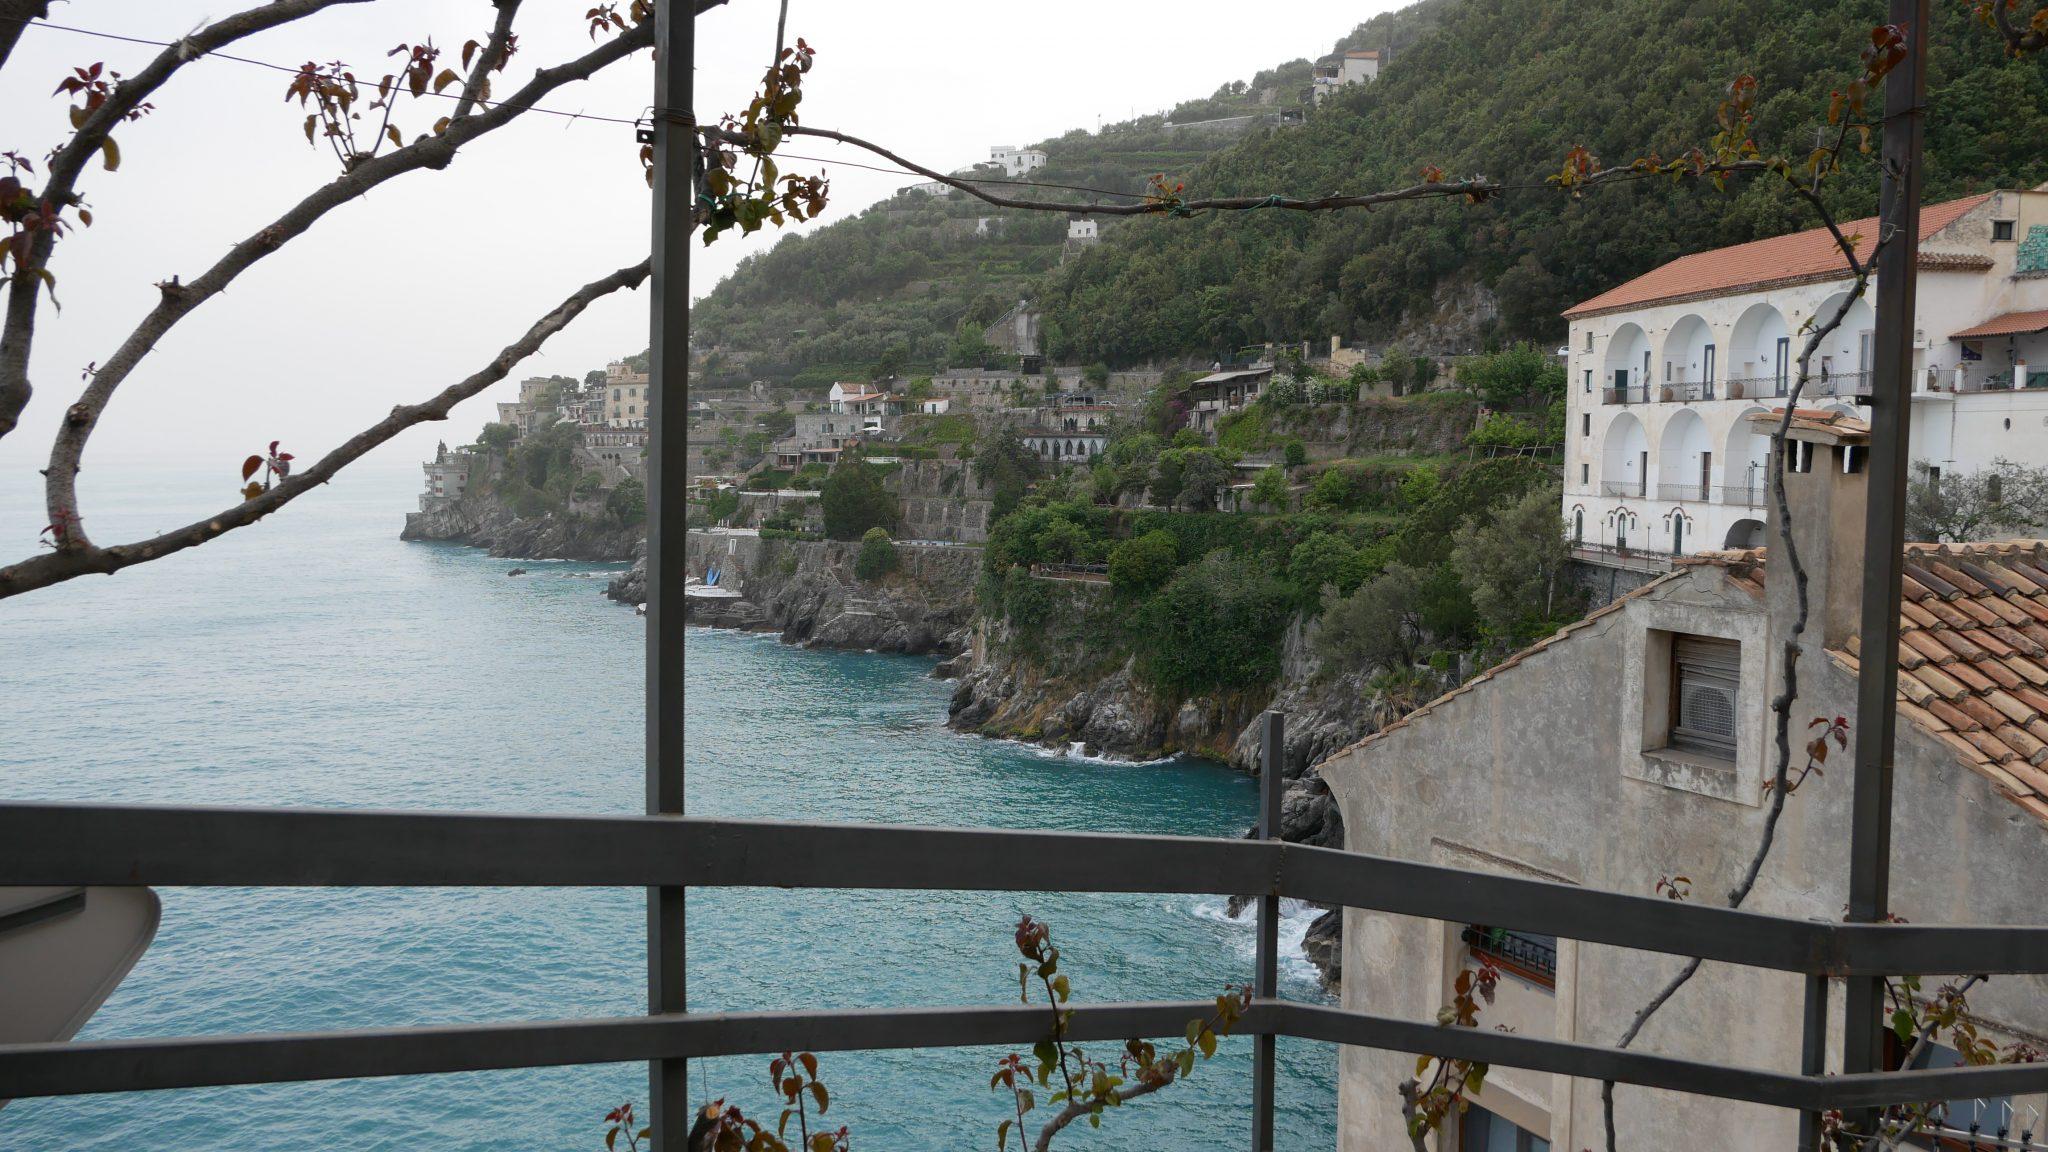 Hotel Marmorata amalfi coast hotel with view